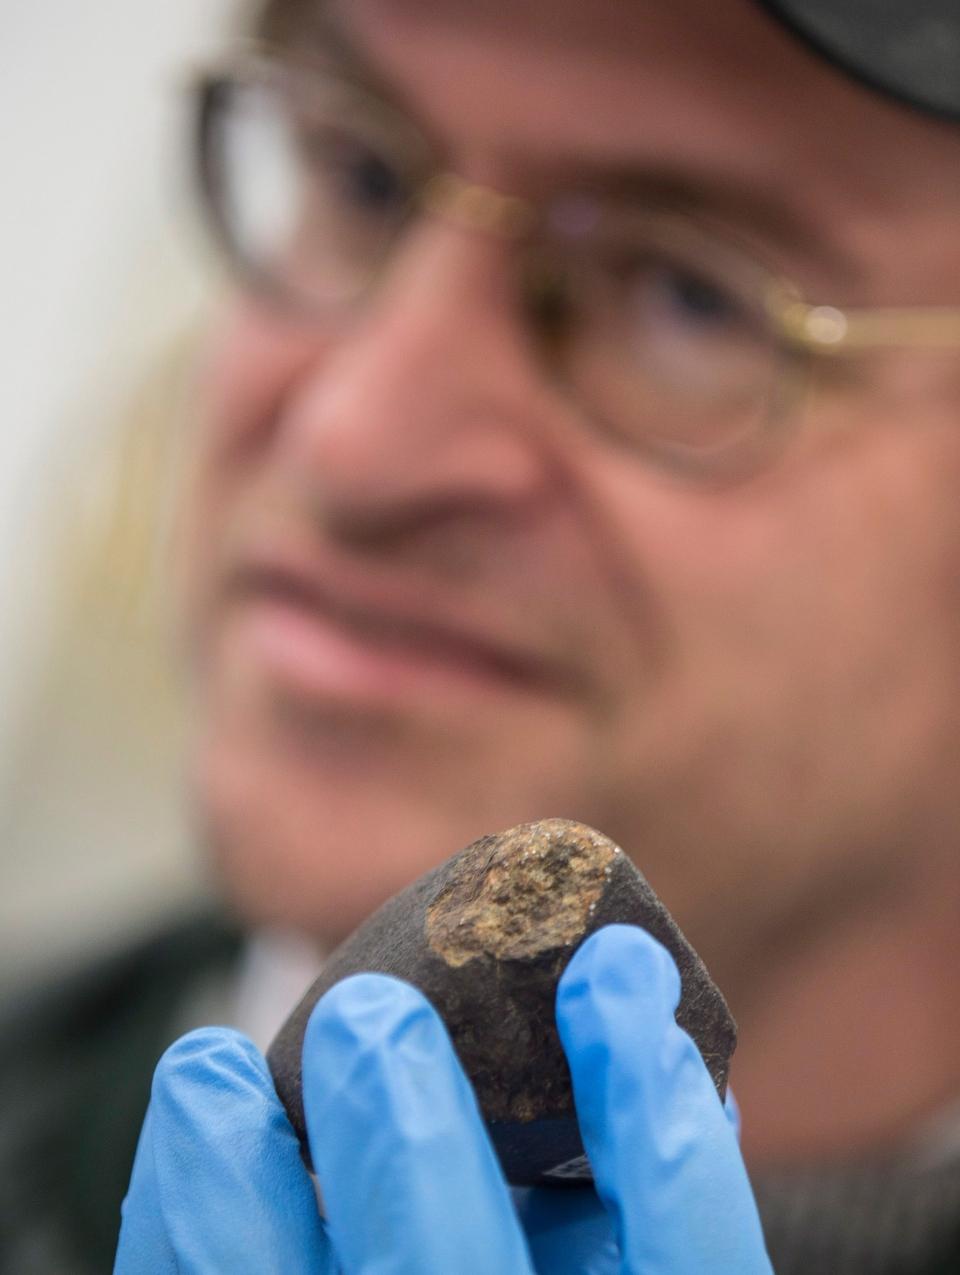 Meteorites said to have landed near St. Thomas